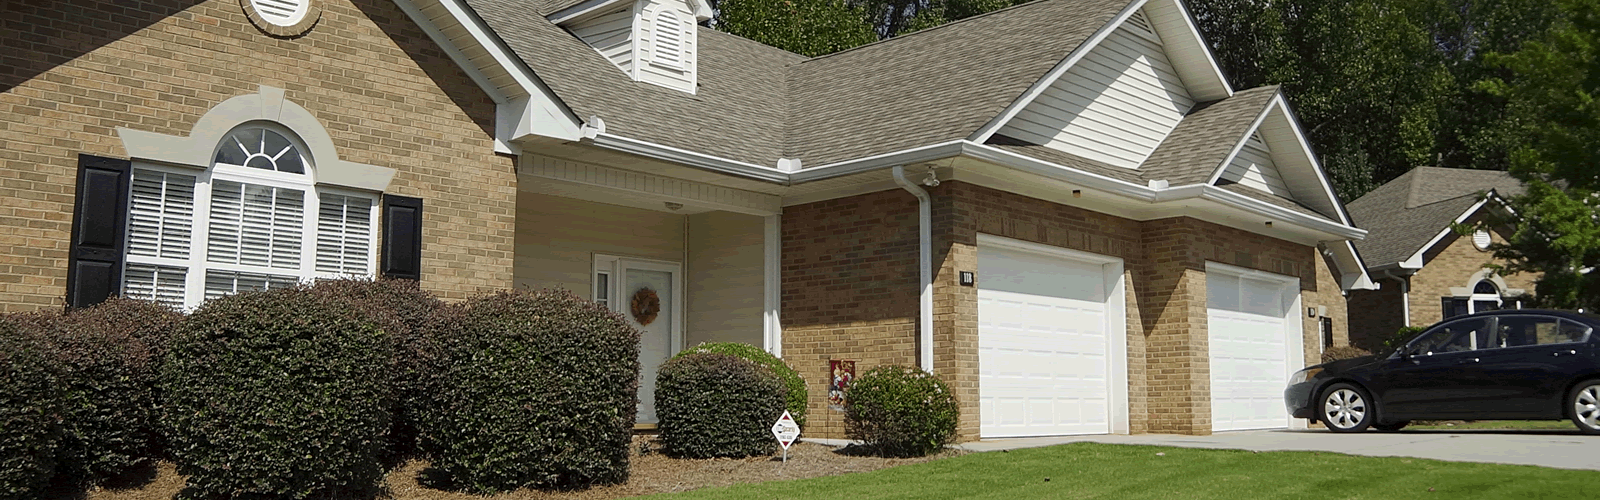 Cottages of Monroe Independent Cottages